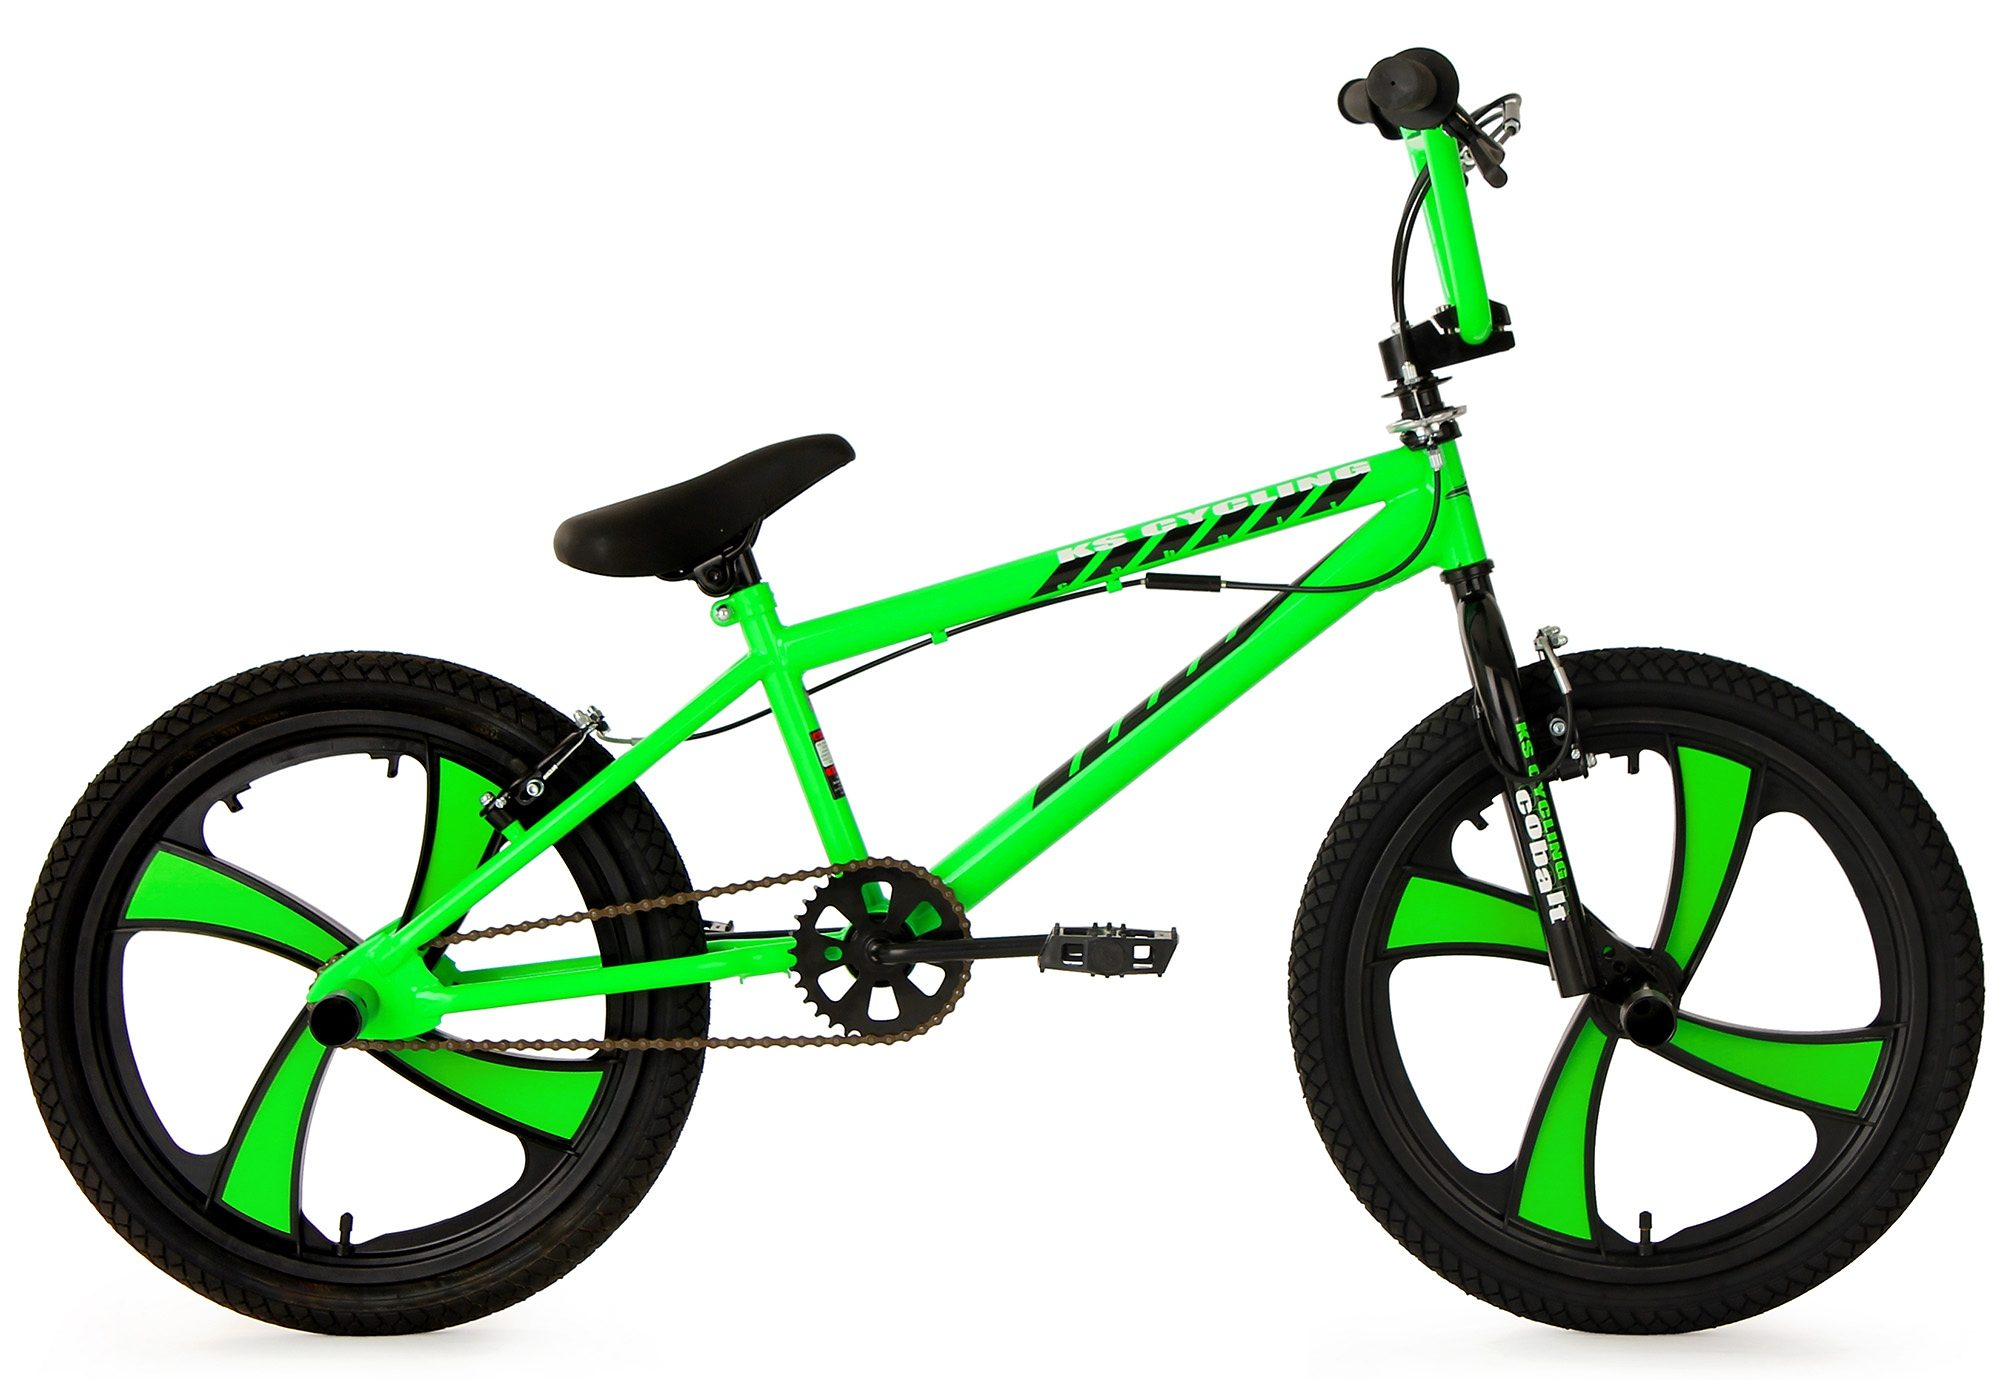 KS Cycling BMX-Rad Cobalt, 1 Gang grün Kinder Damenfahrräder Fahrräder Zubehör